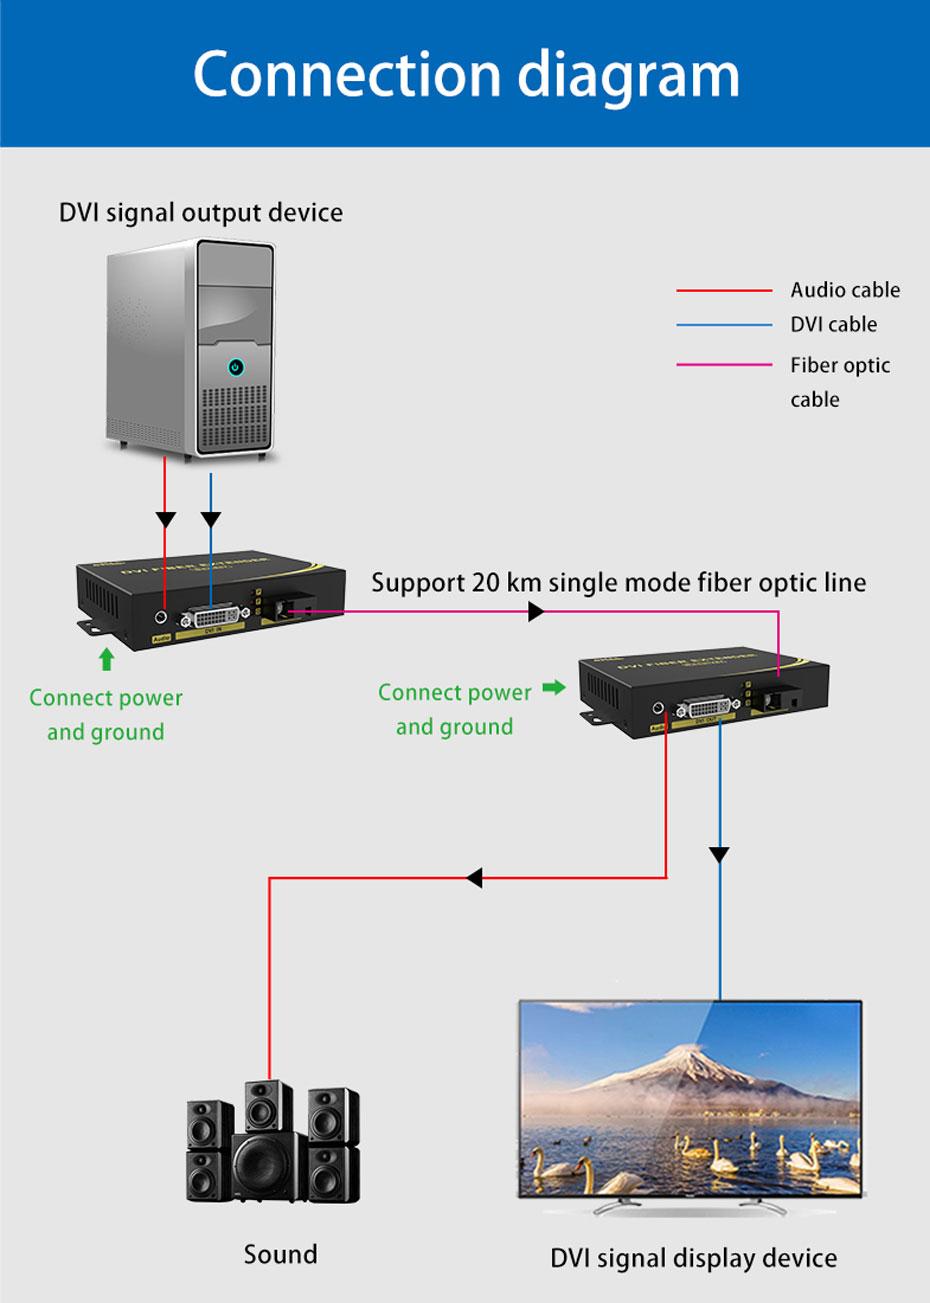 DVI optical transceiver DF200 connection diagram